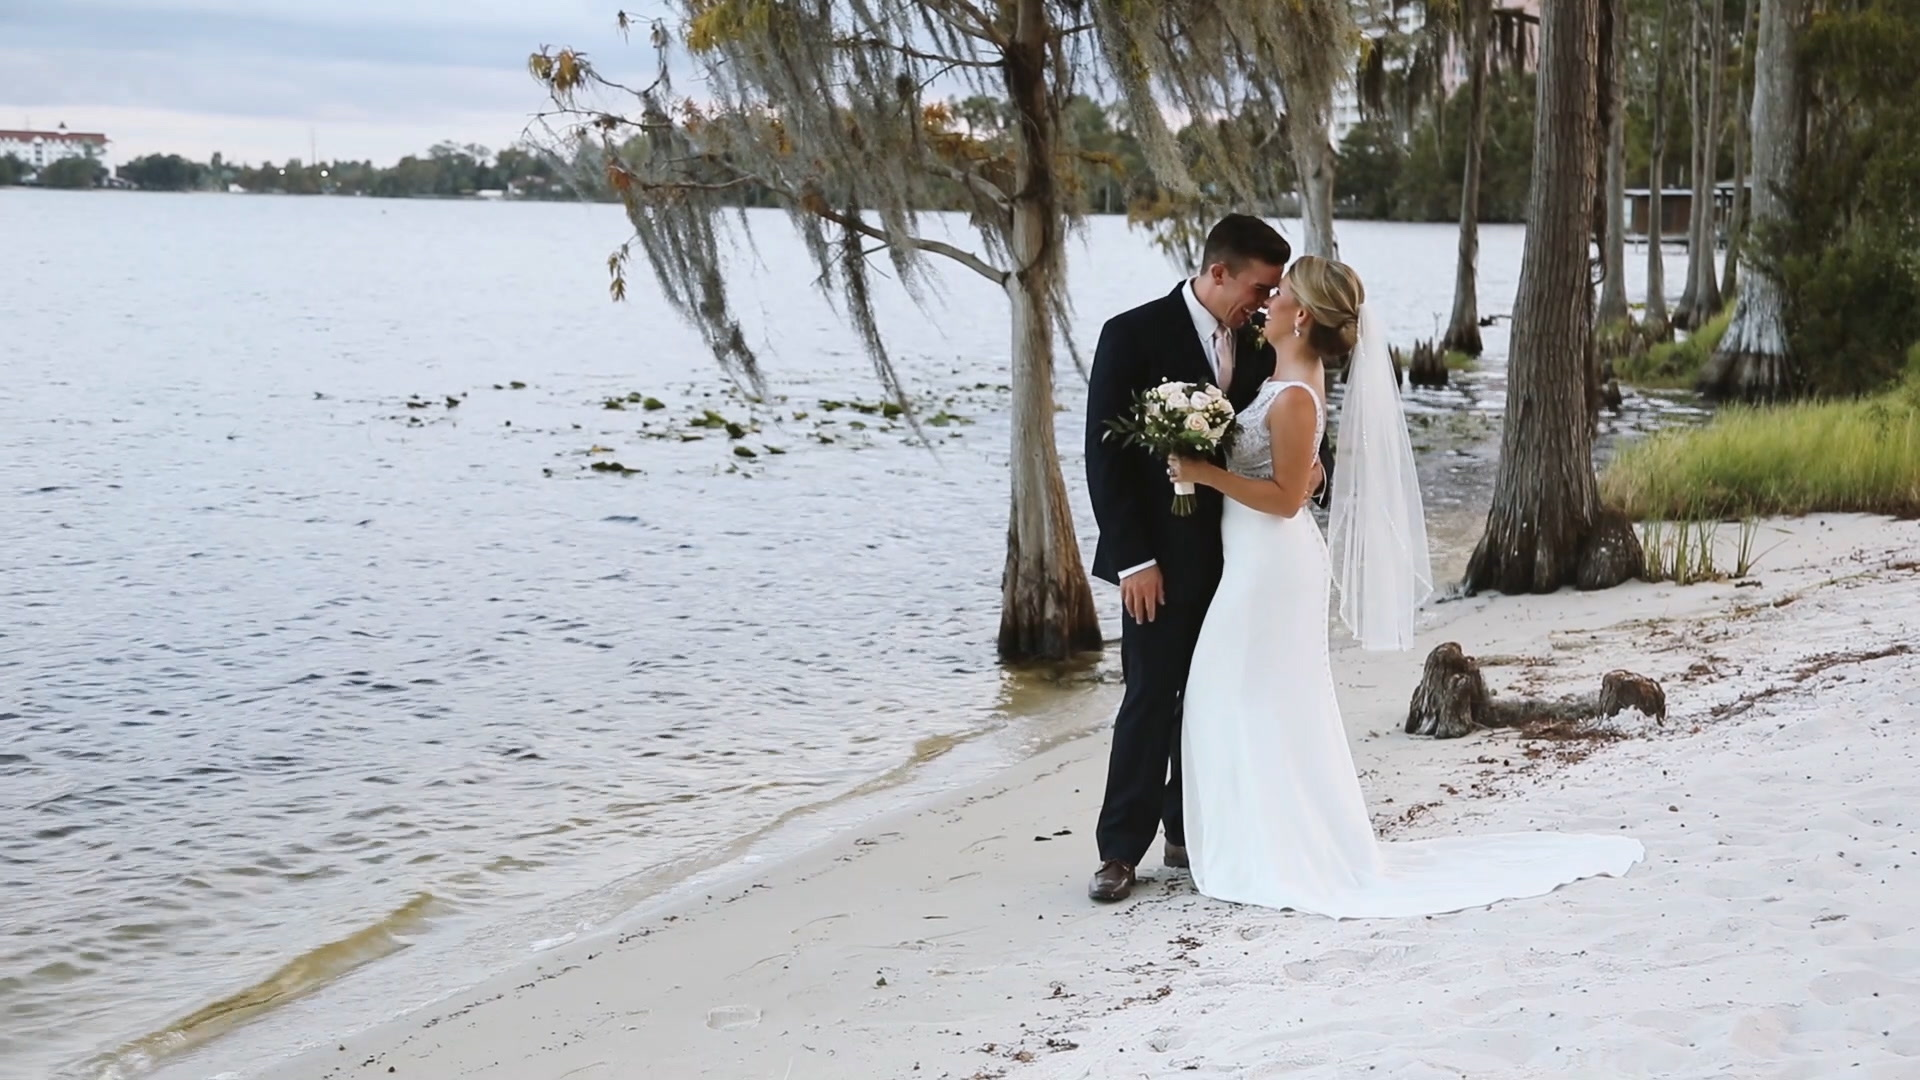 Eugene + Michelle   Orlando, Florida   Paradise Cove Orlando